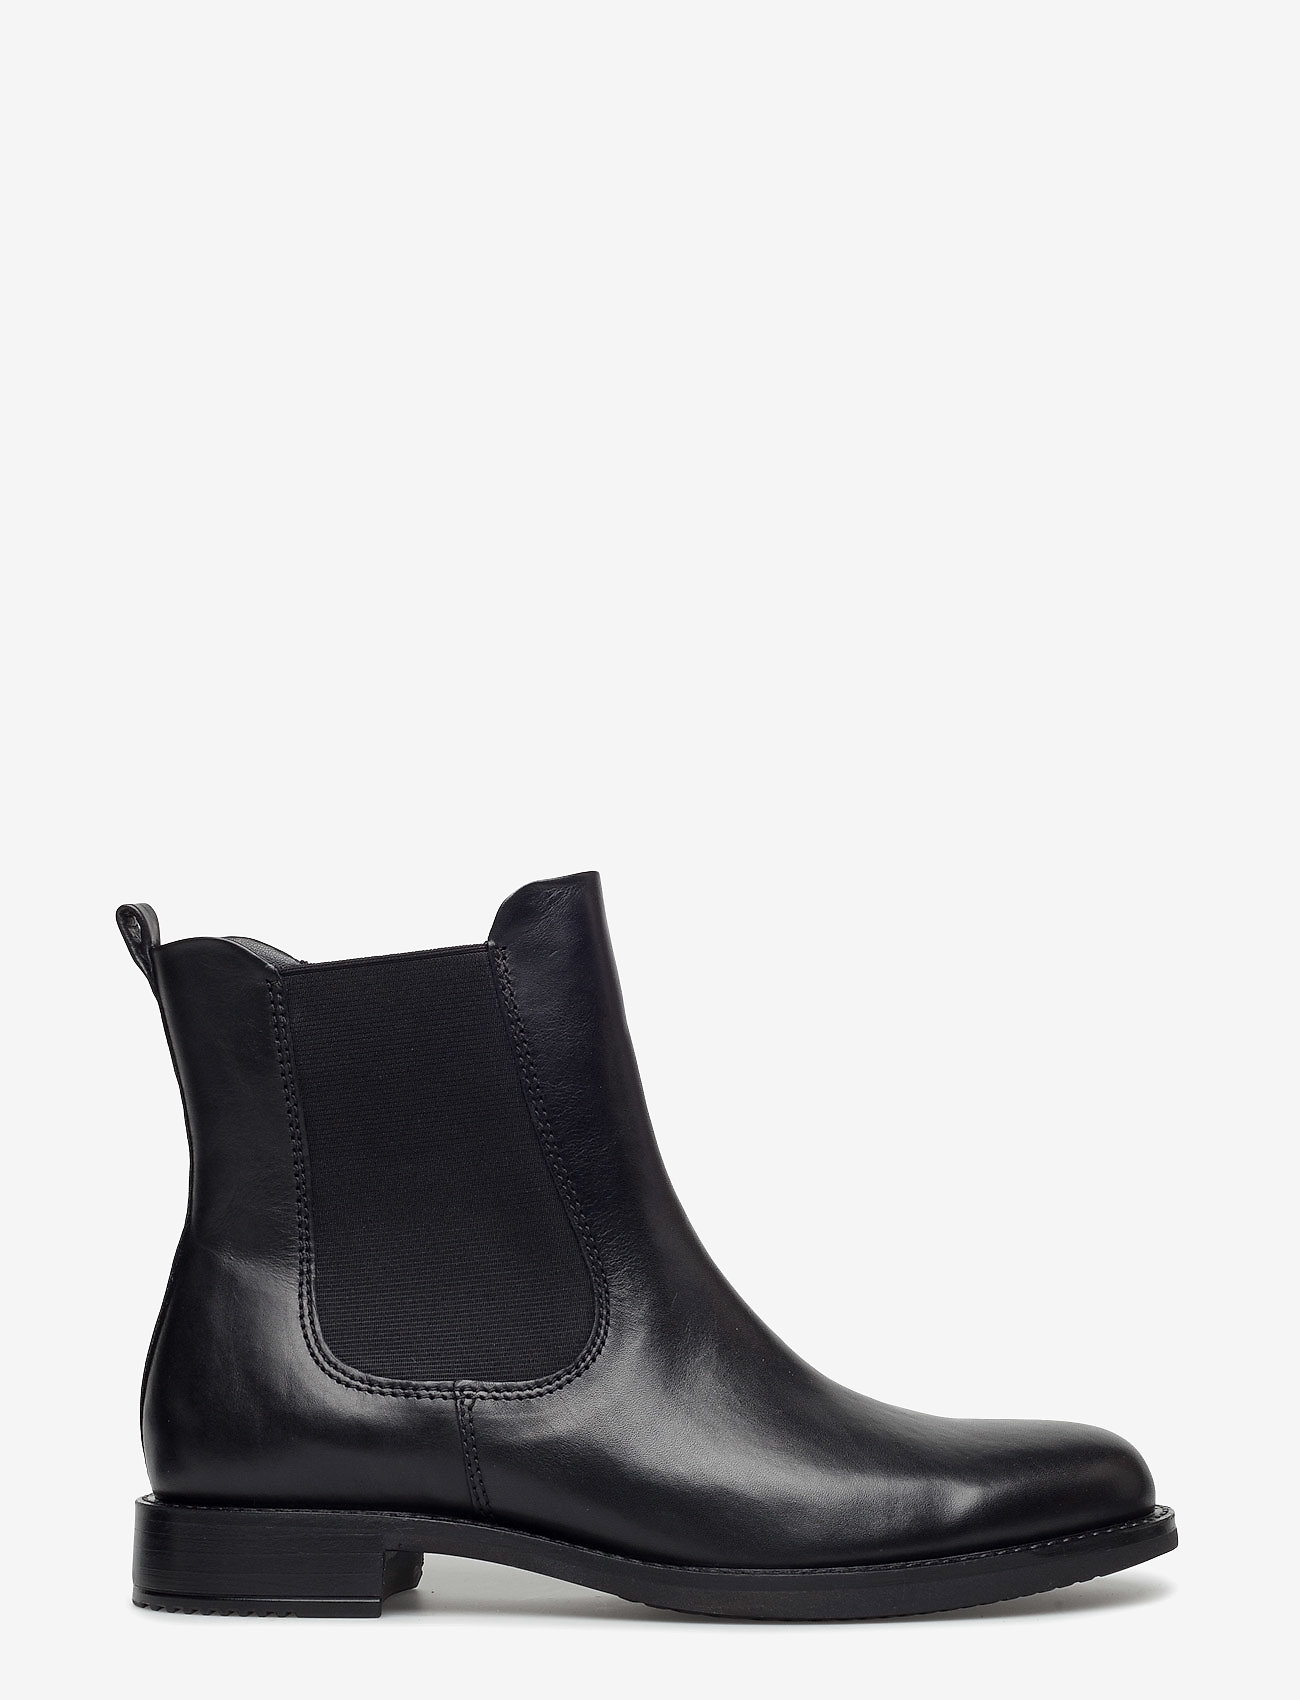 ECCO - SARTORELLE 25 - chelsea boots - black - 1